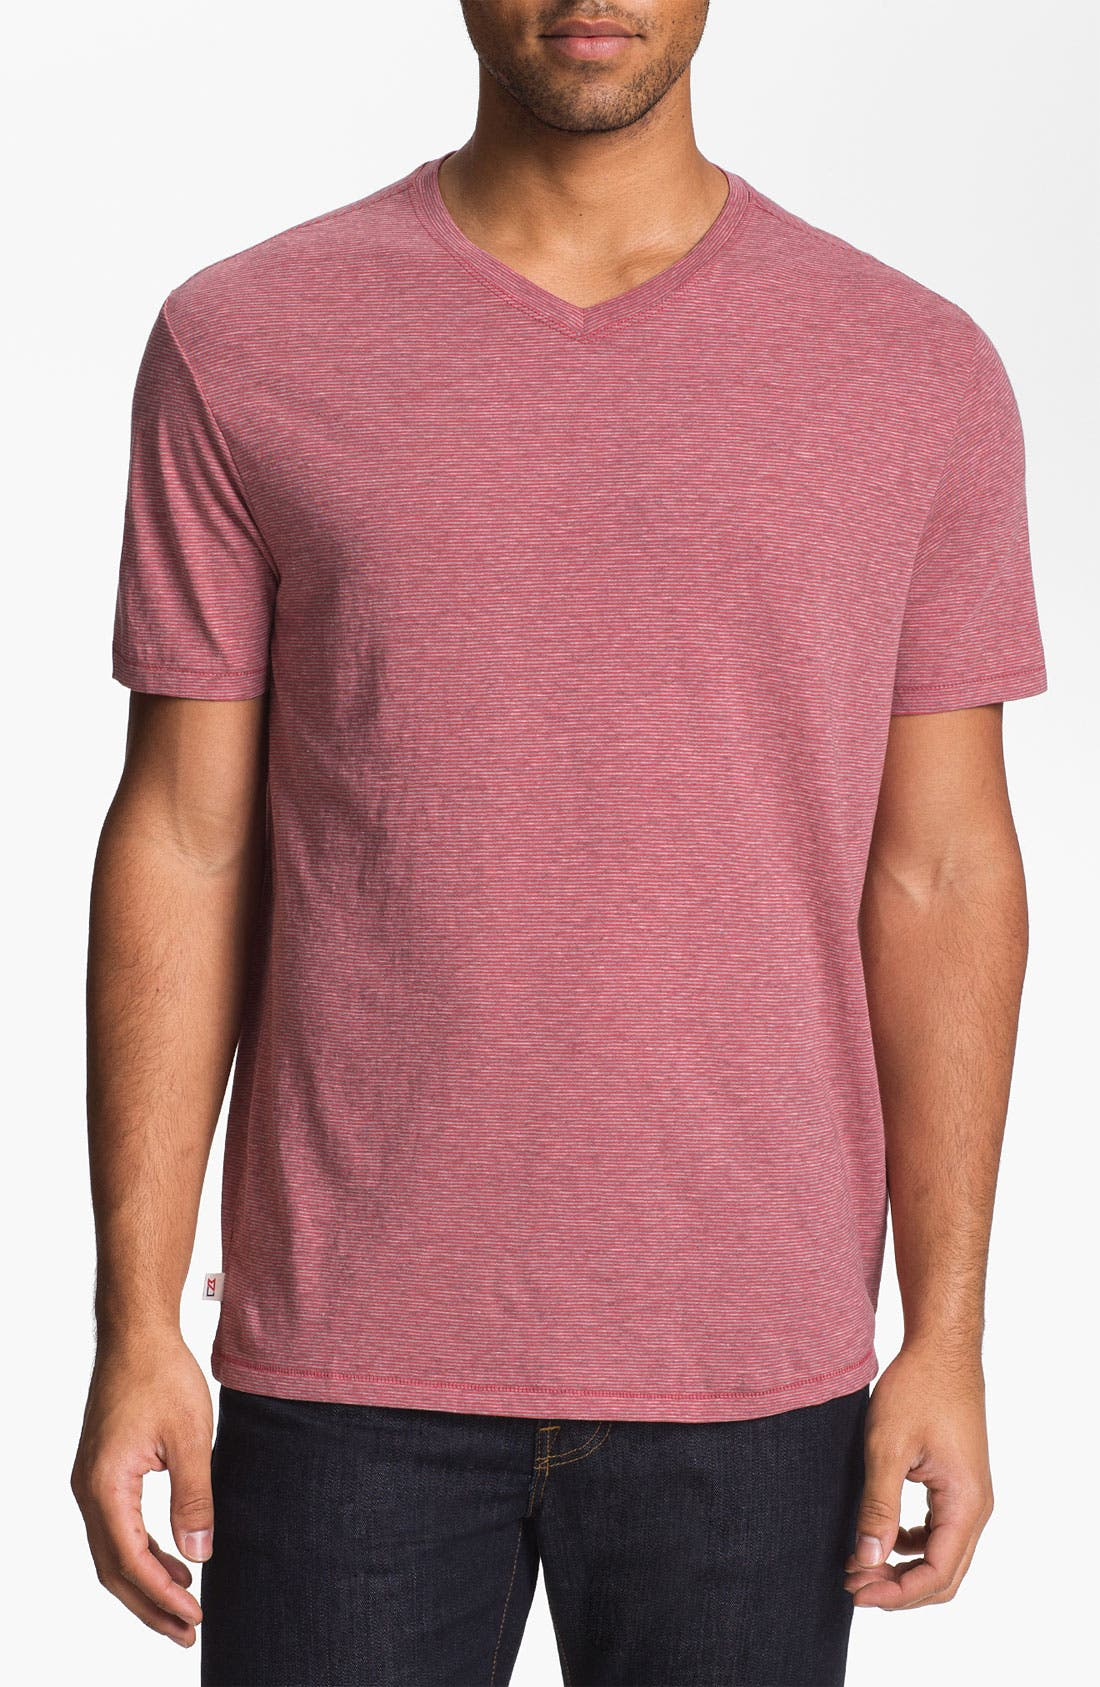 Main Image - Cutter & Buck 'Vashon' V-Neck T-Shirt (Big & Tall)